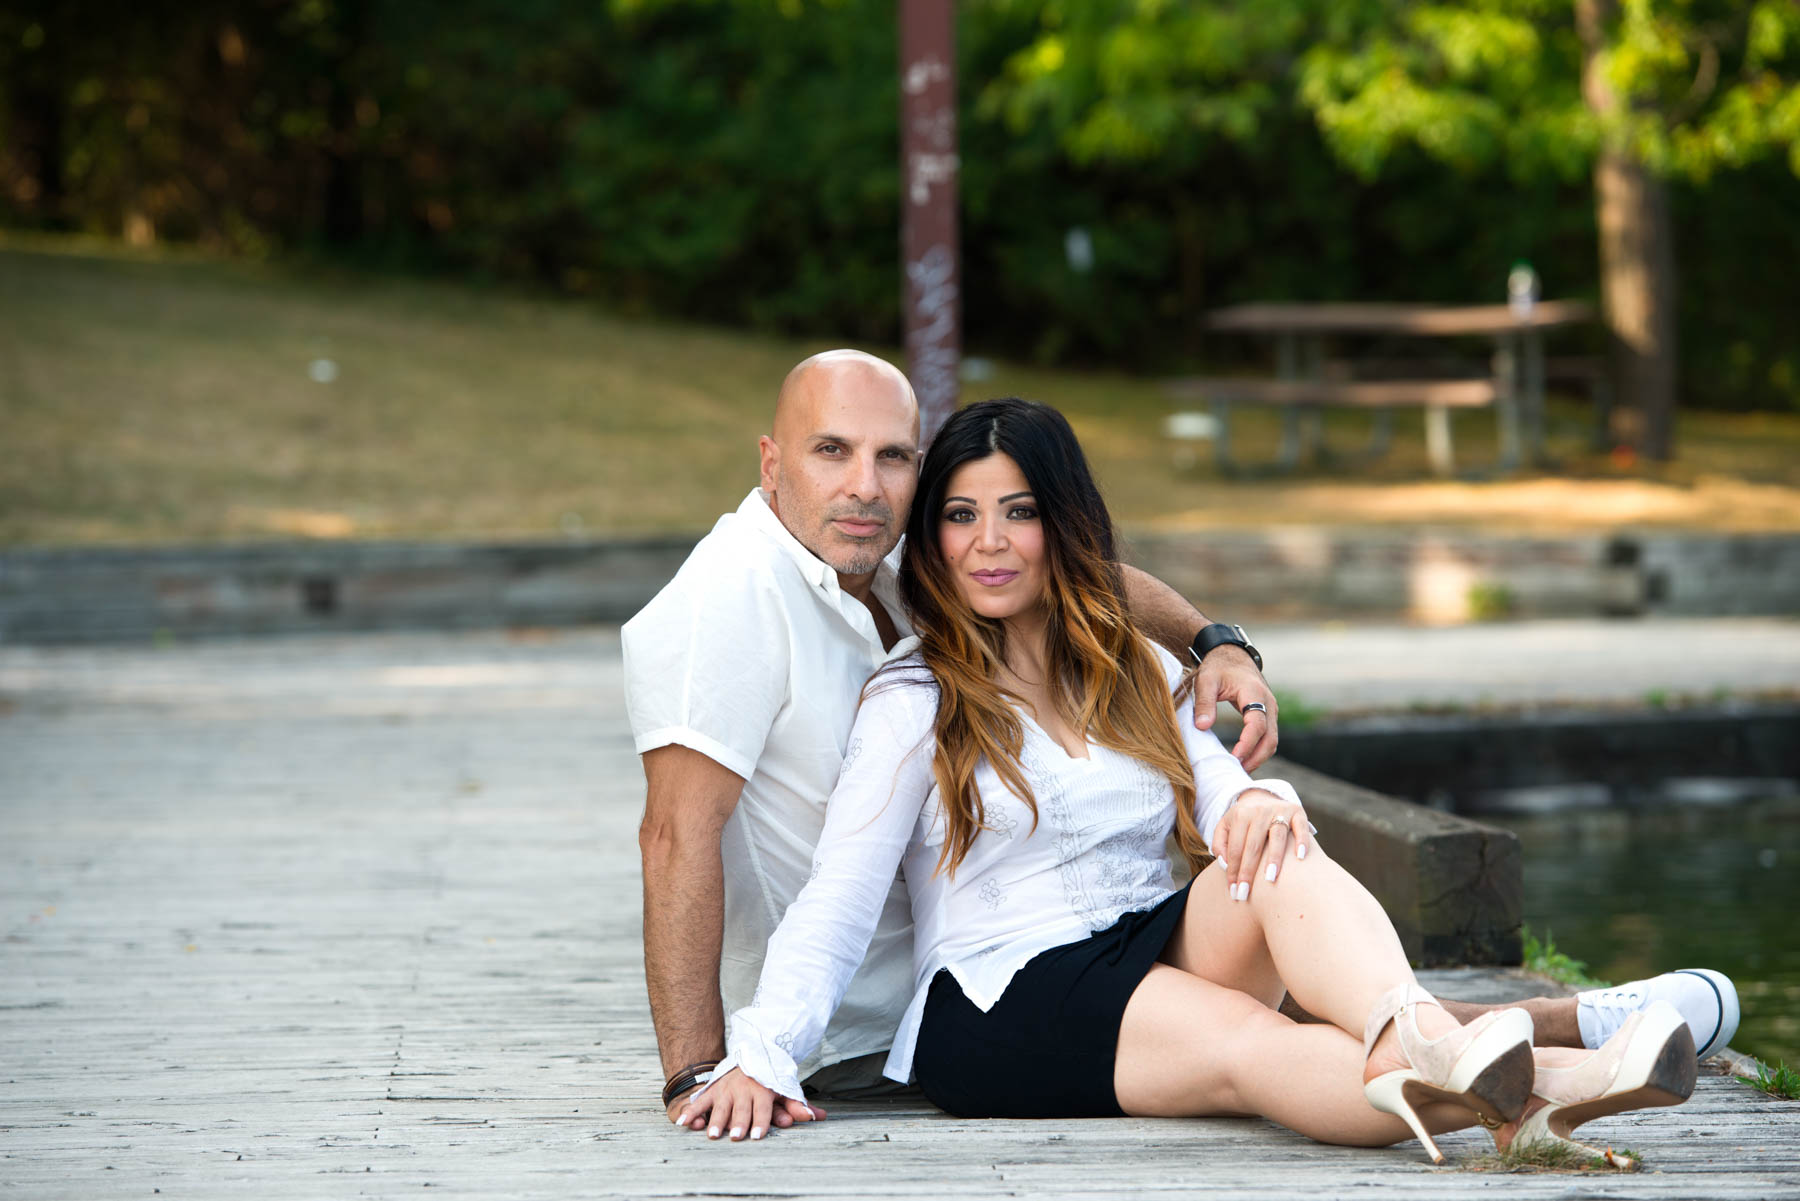 001 - Engagement FL Humber Bay Park - Toronto